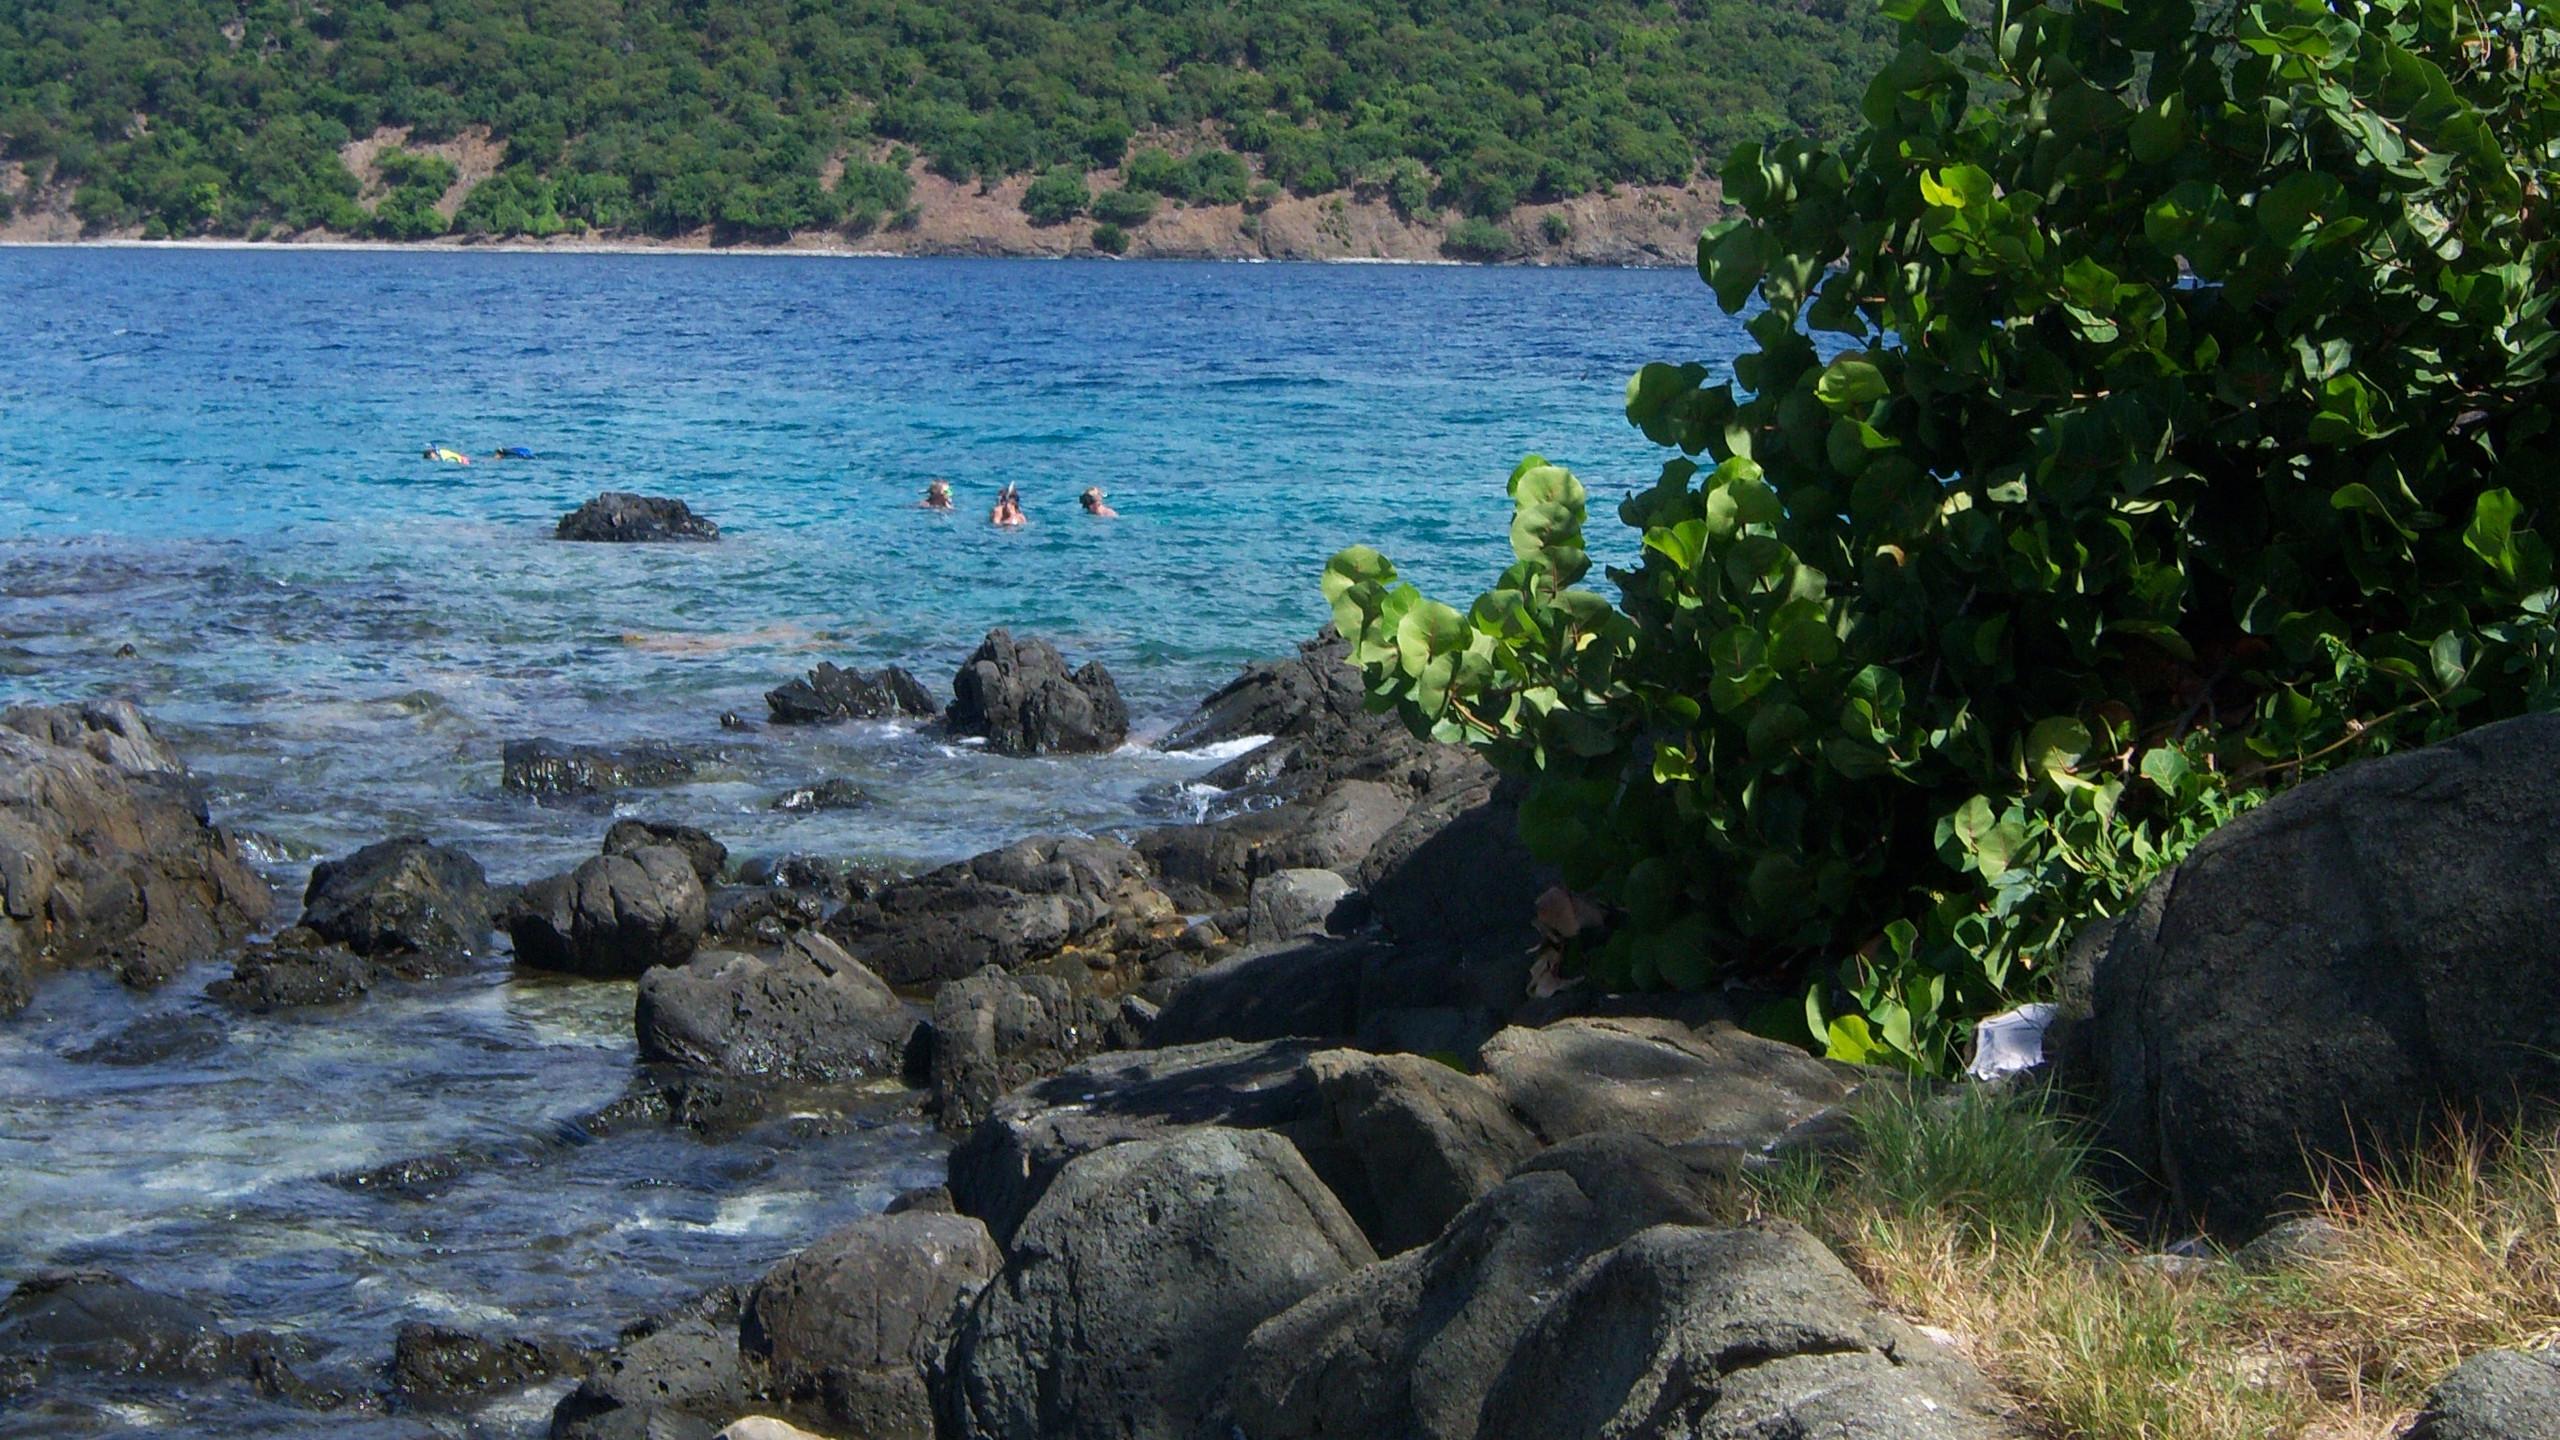 Cobi Beach